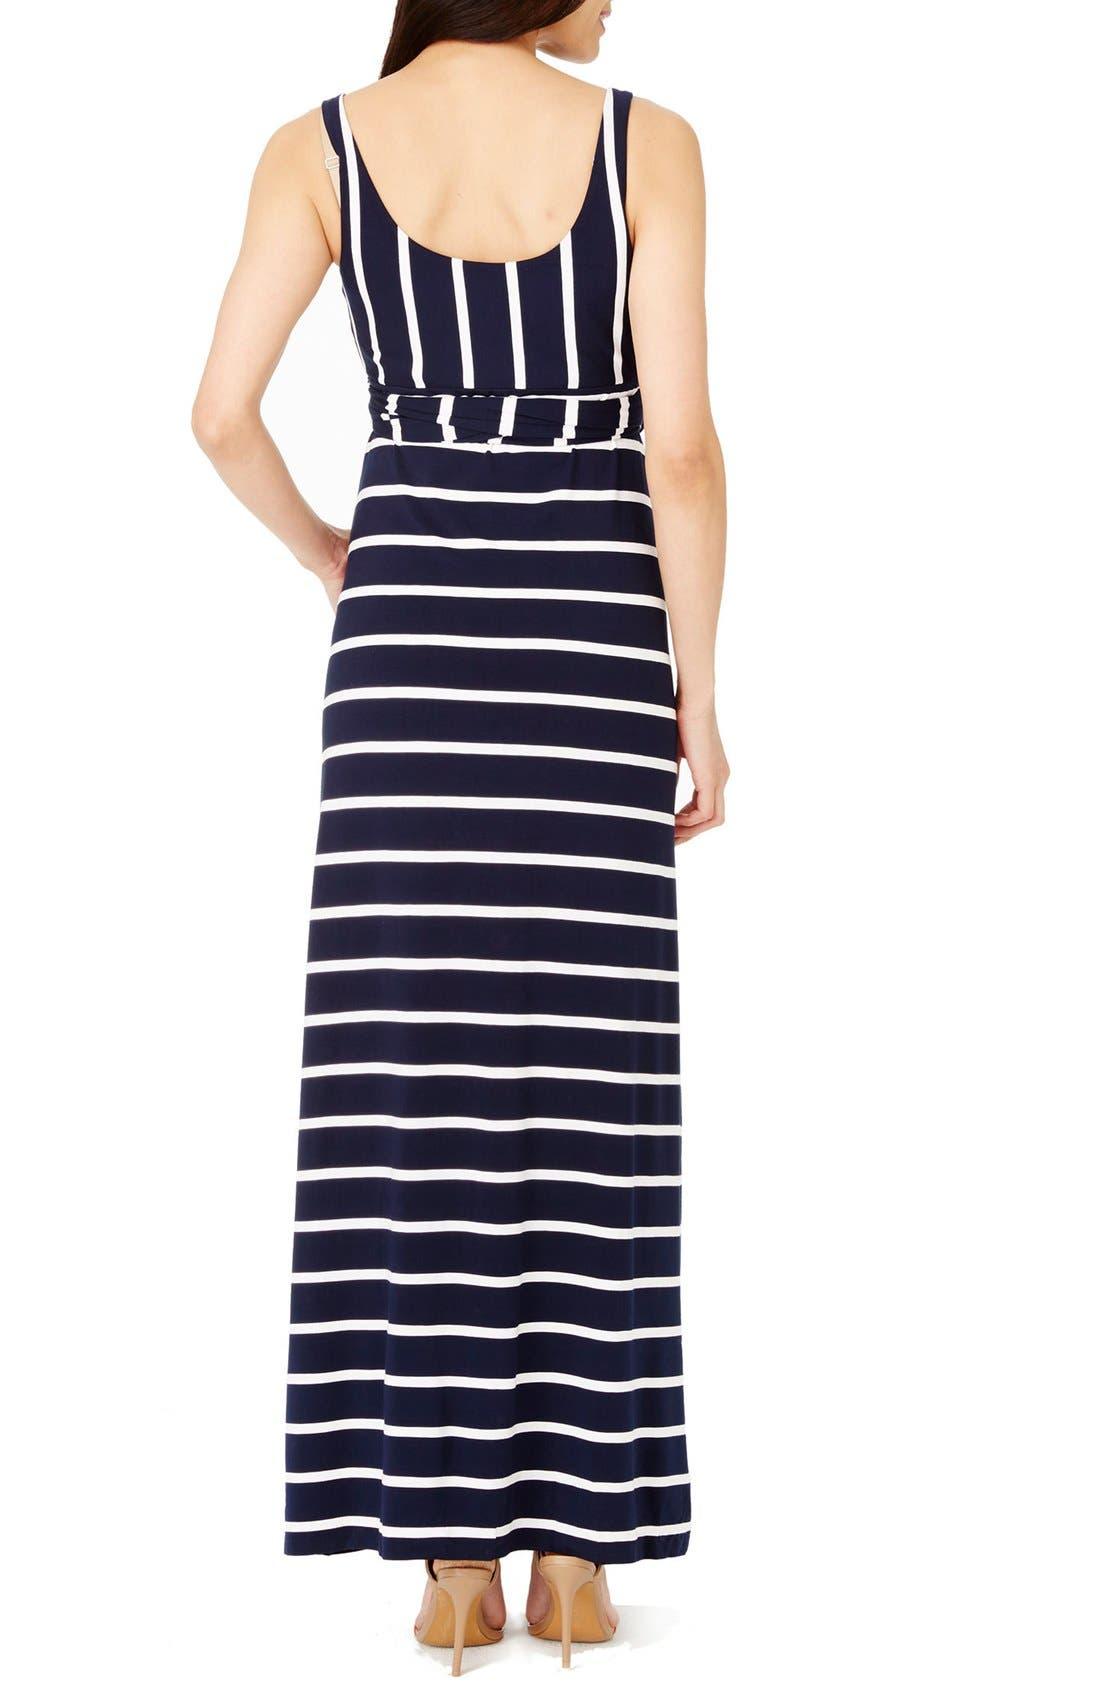 'Kendal' Stripe Maternity Maxi Dress,                             Alternate thumbnail 2, color,                             Navy White Stripe